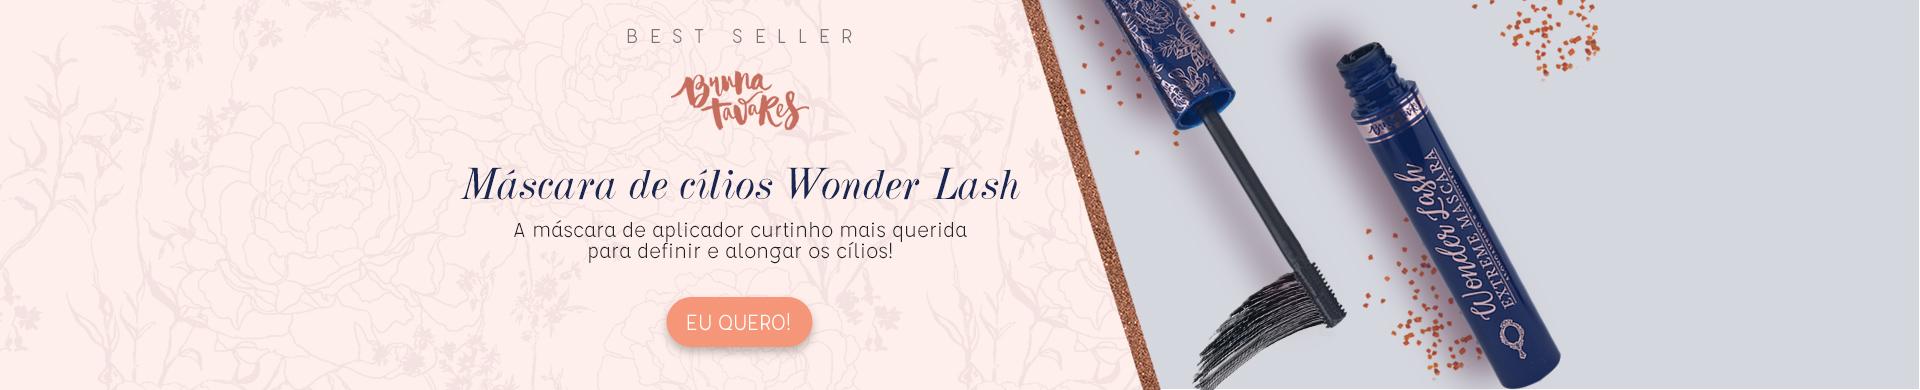 Best Seller Wonder Lash